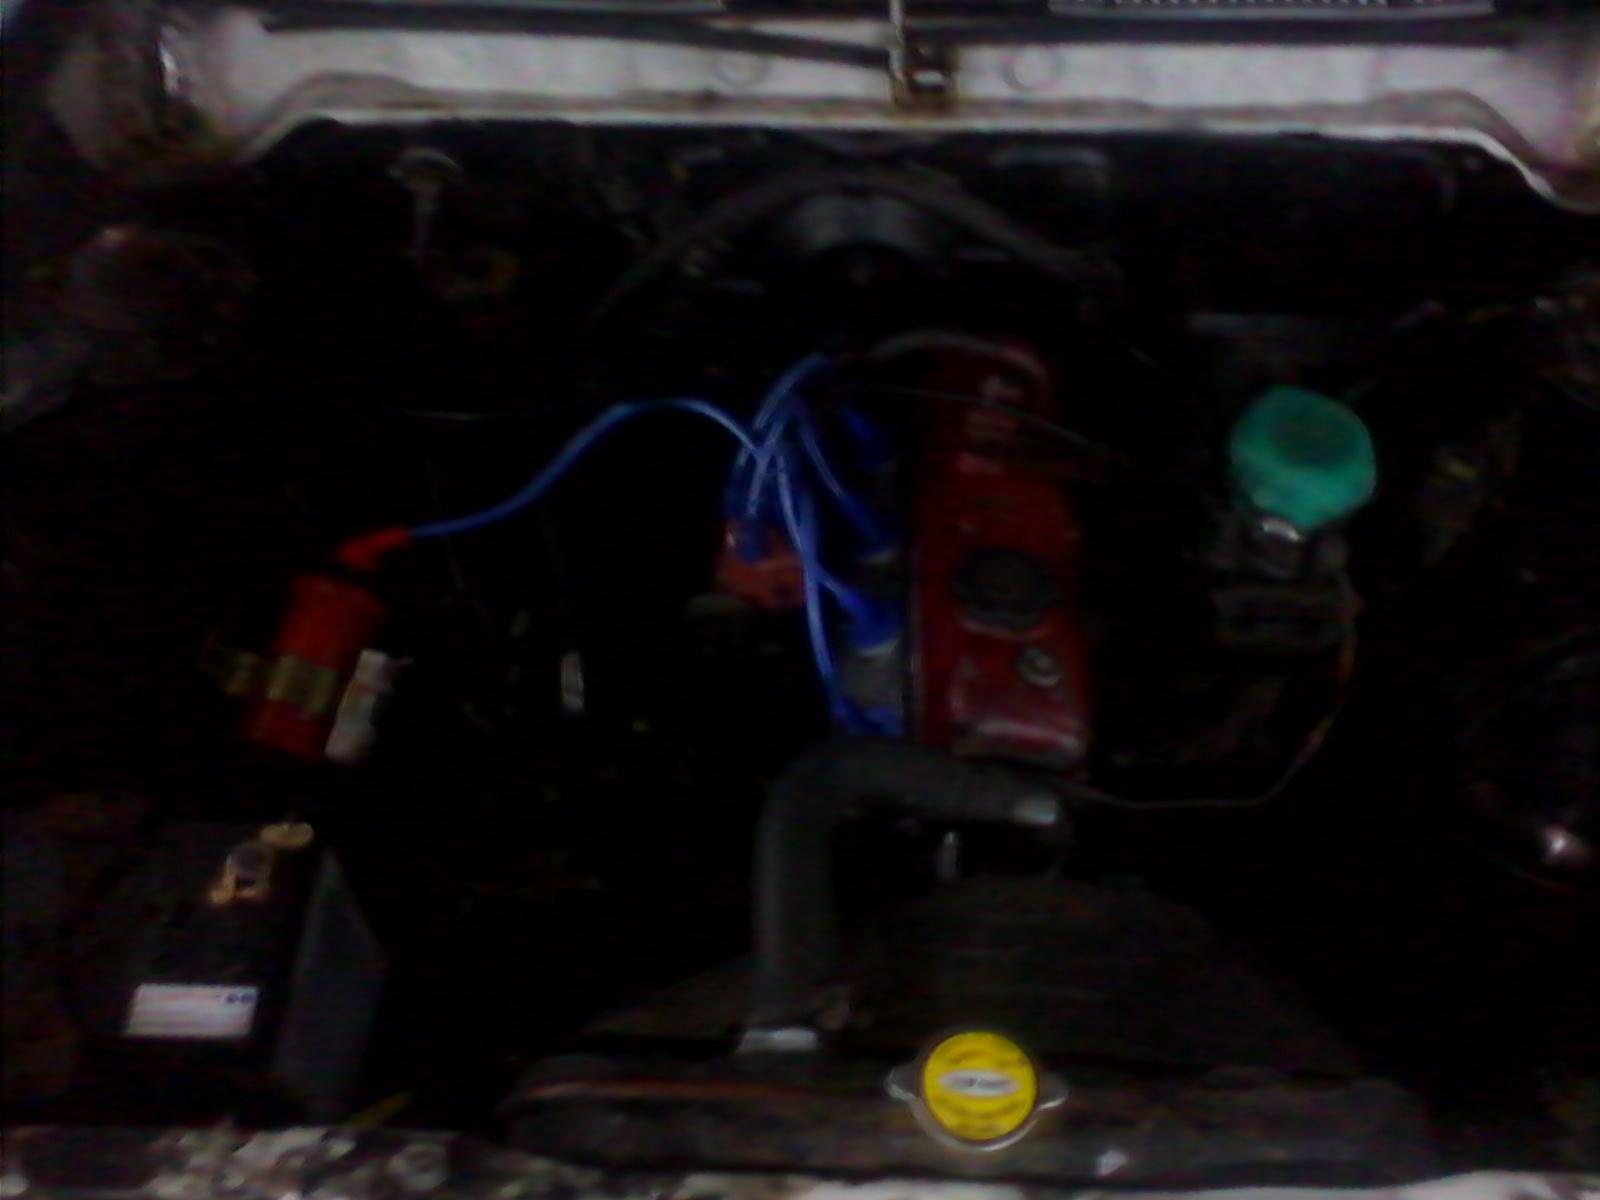 3k engine